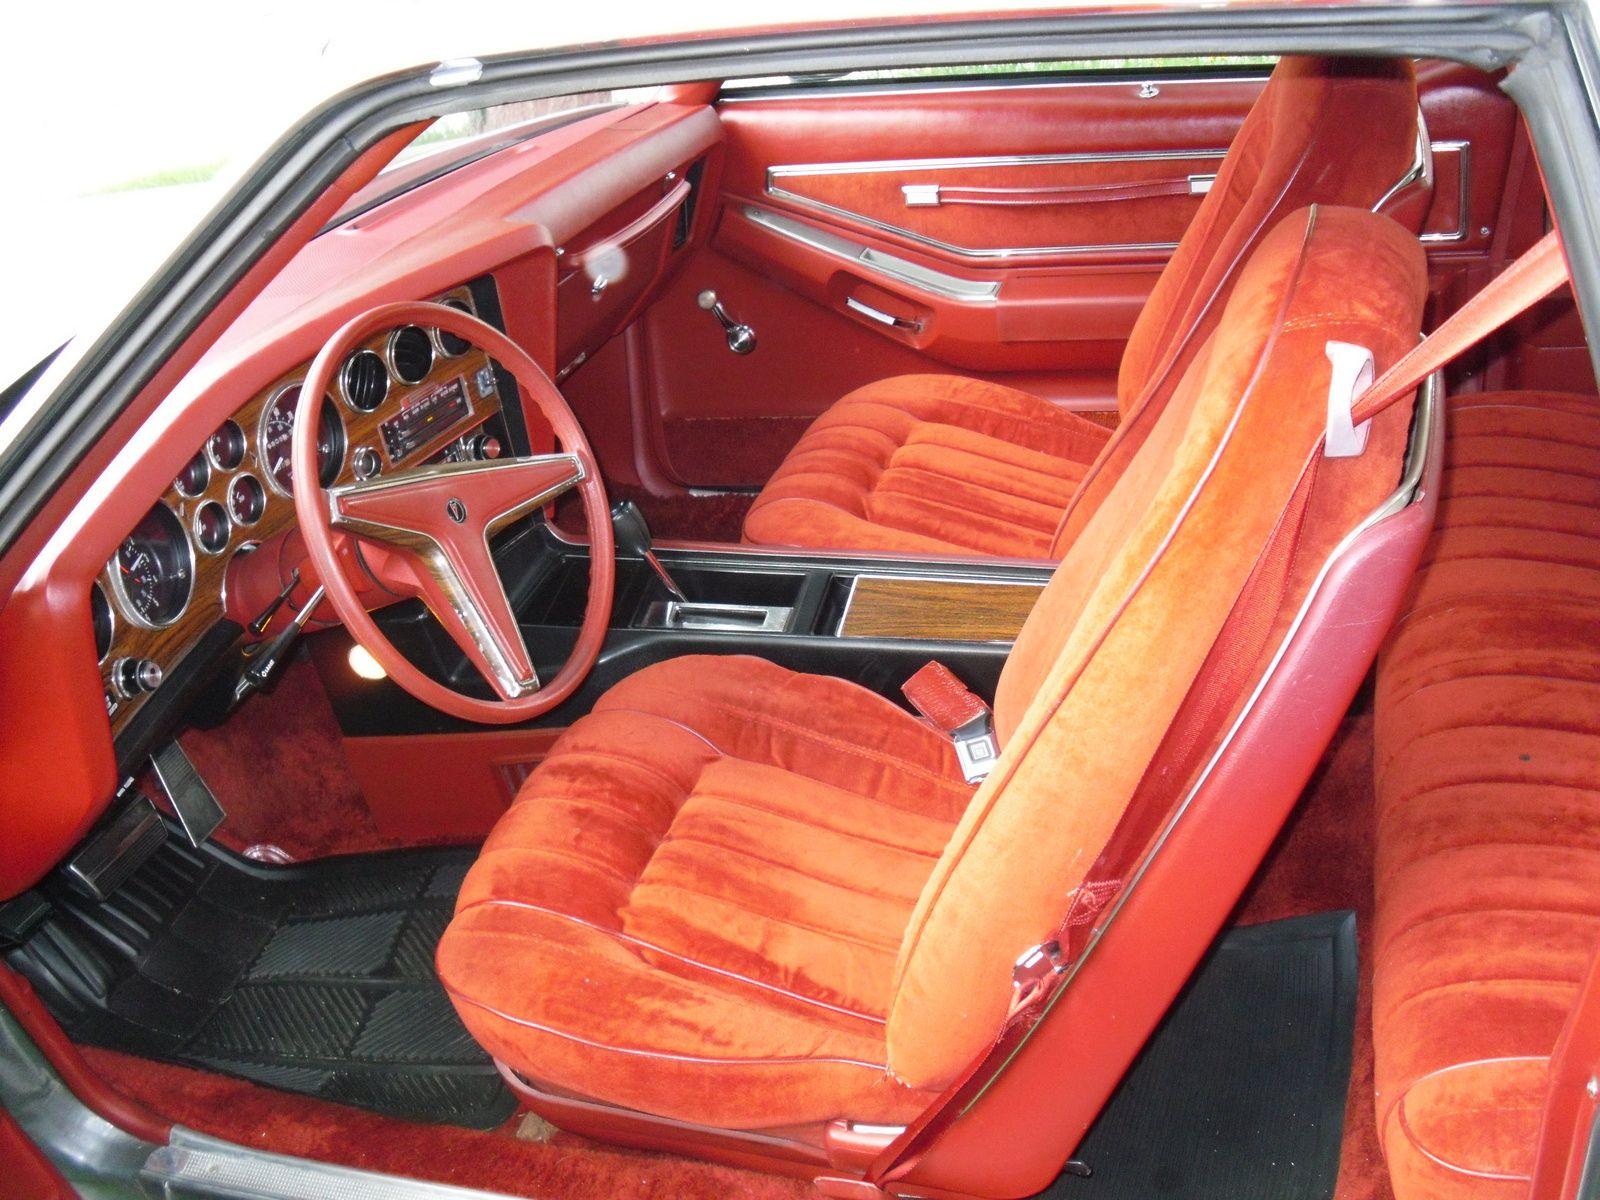 Picture Of 1977 Pontiac Grand Prix Sj Interior Roger Had This